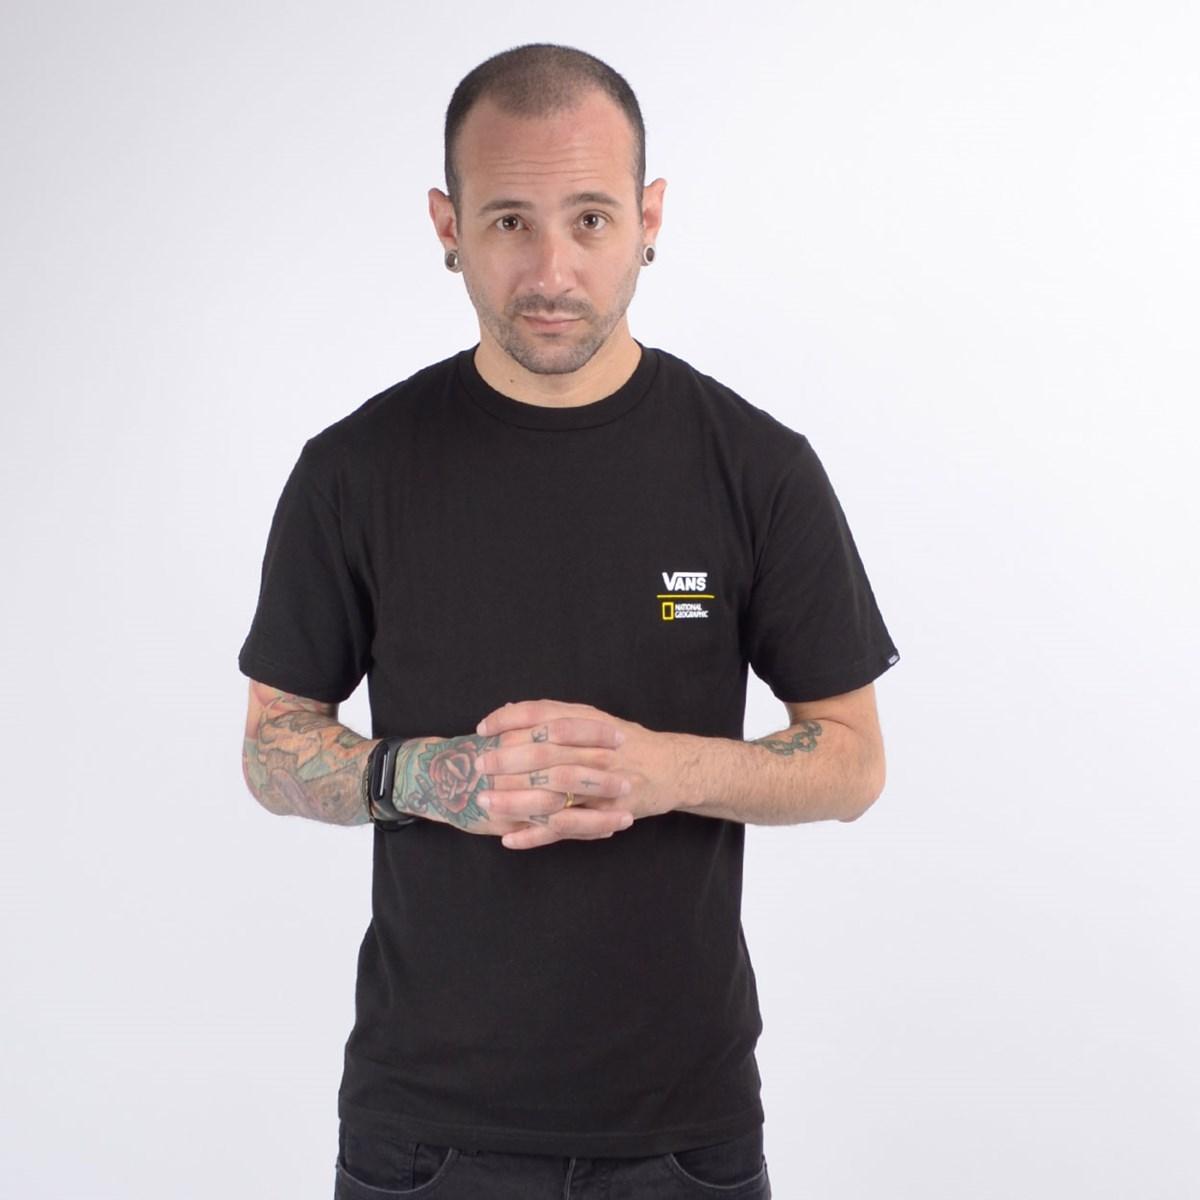 Camiseta Vans Masculina National Geographic Globe SS Black VN0A4MSHBLK